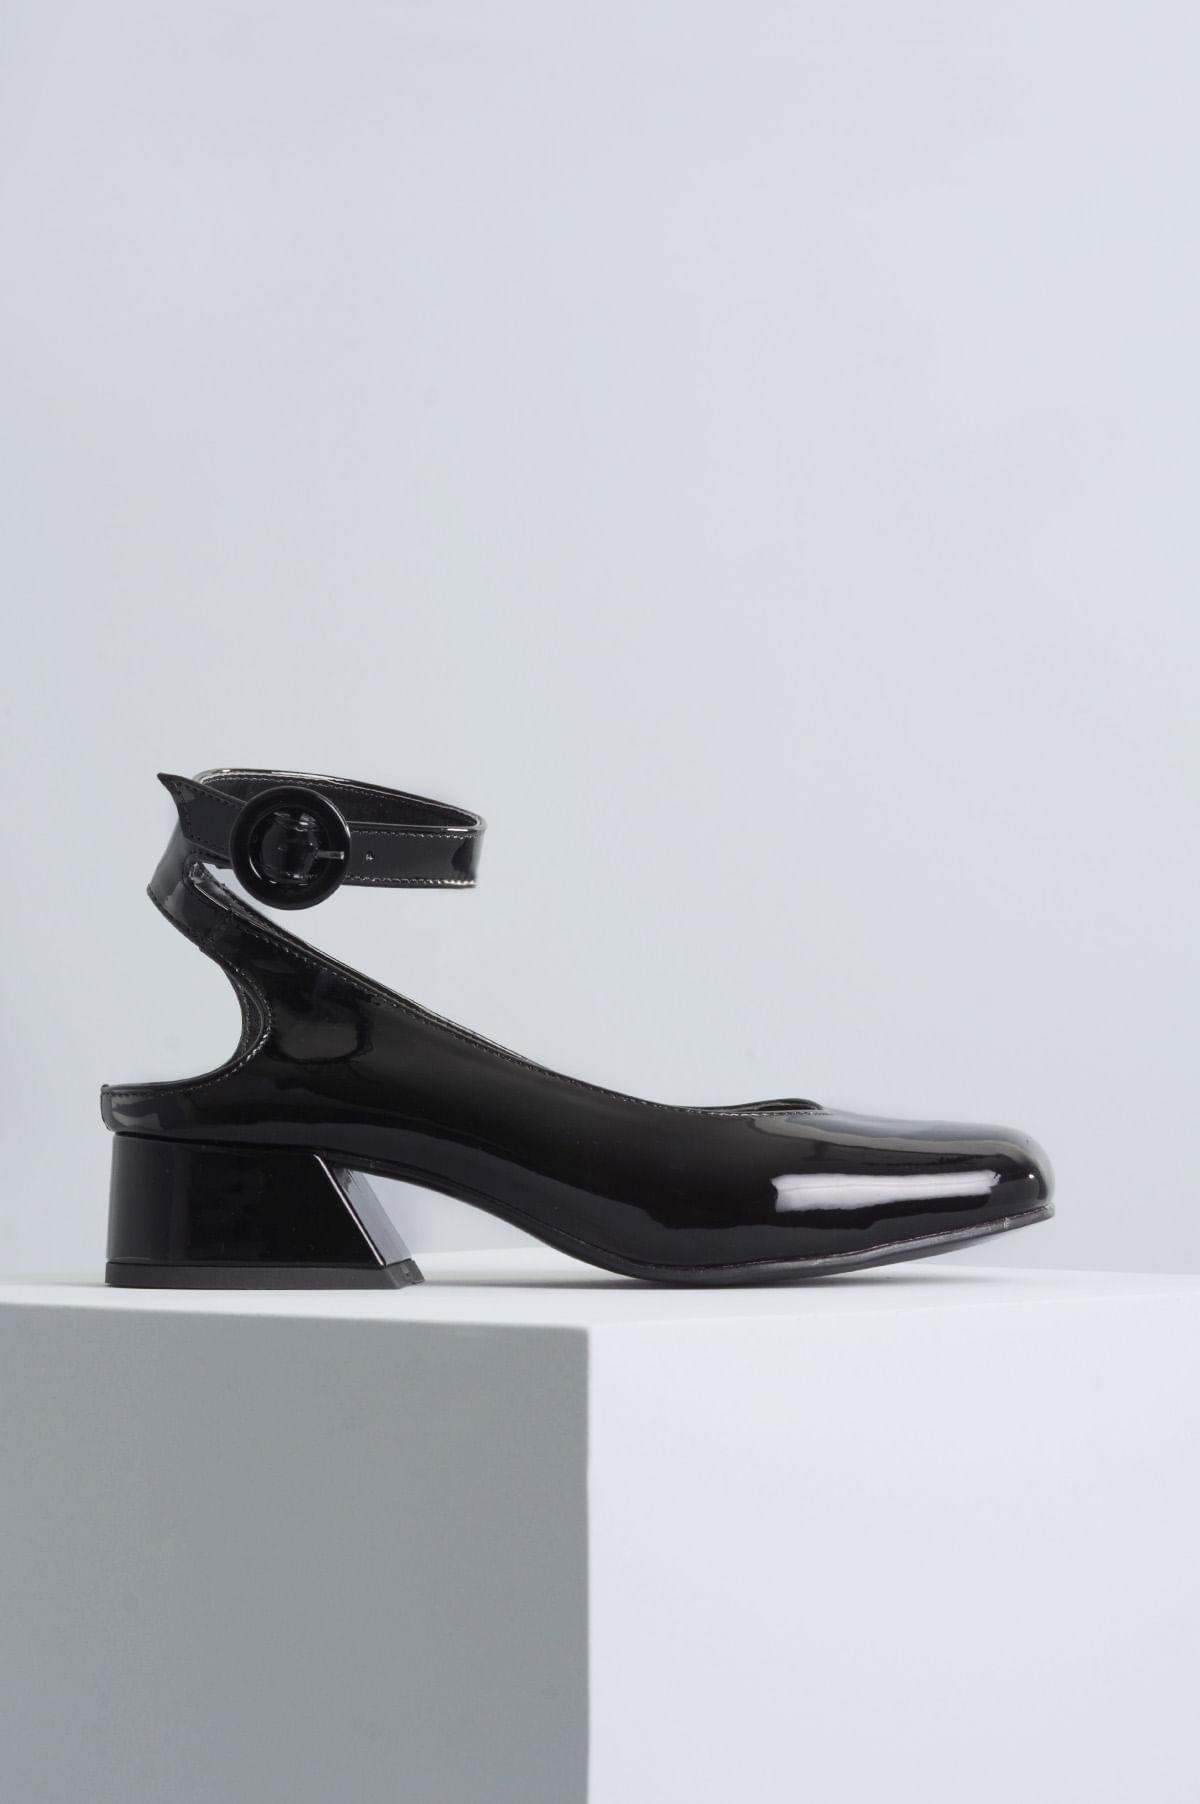 511d893b3 Sapato Feminino Salto Baixo Margot Mundial VERNIZ PRETO - Mundial ...